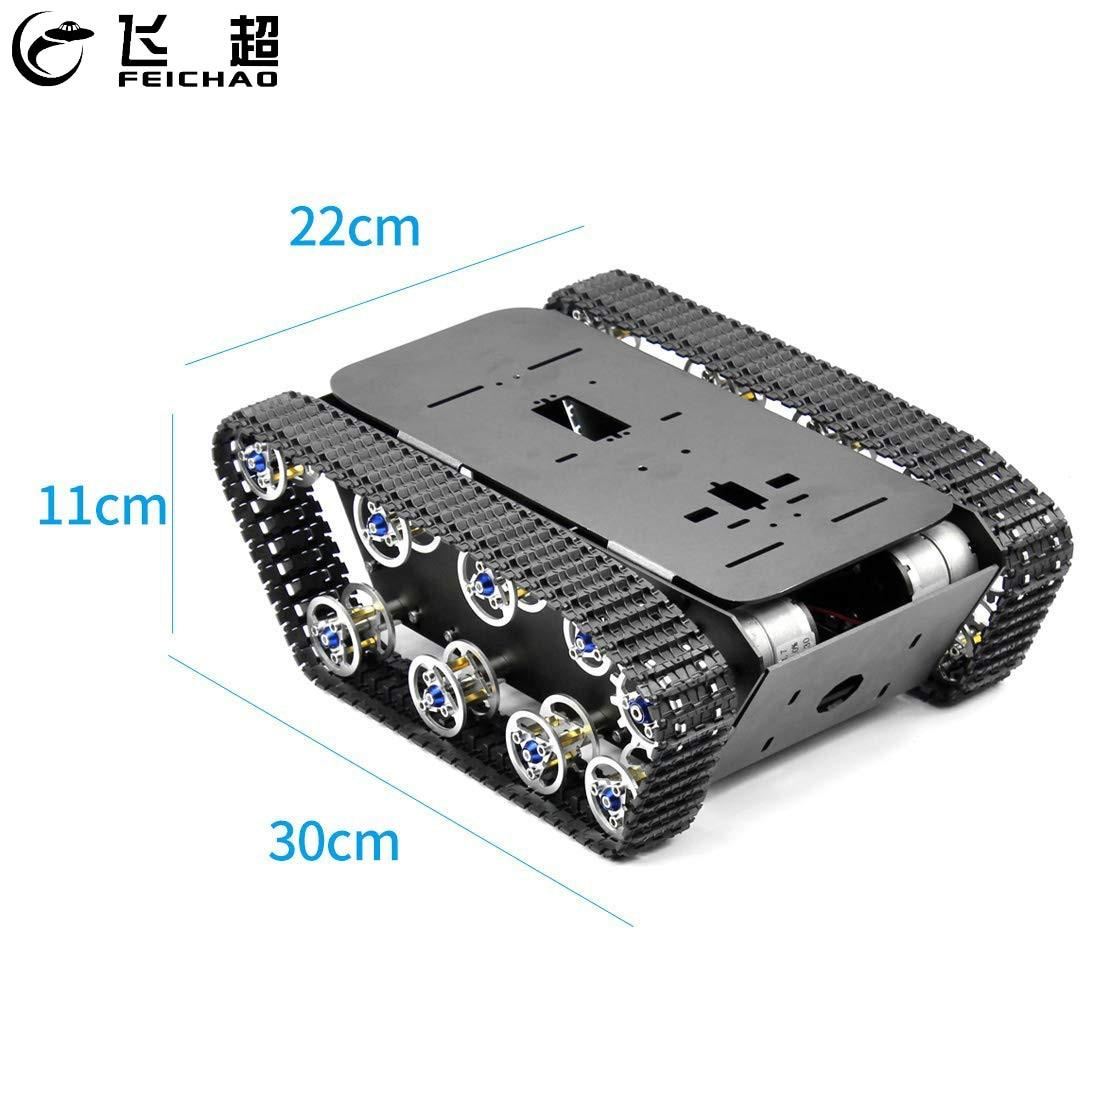 Smart Robot Car Tank Chassis Kit Aluminum Alloy Big Platform with Motors for DIY Remote Control Robot Car Toys